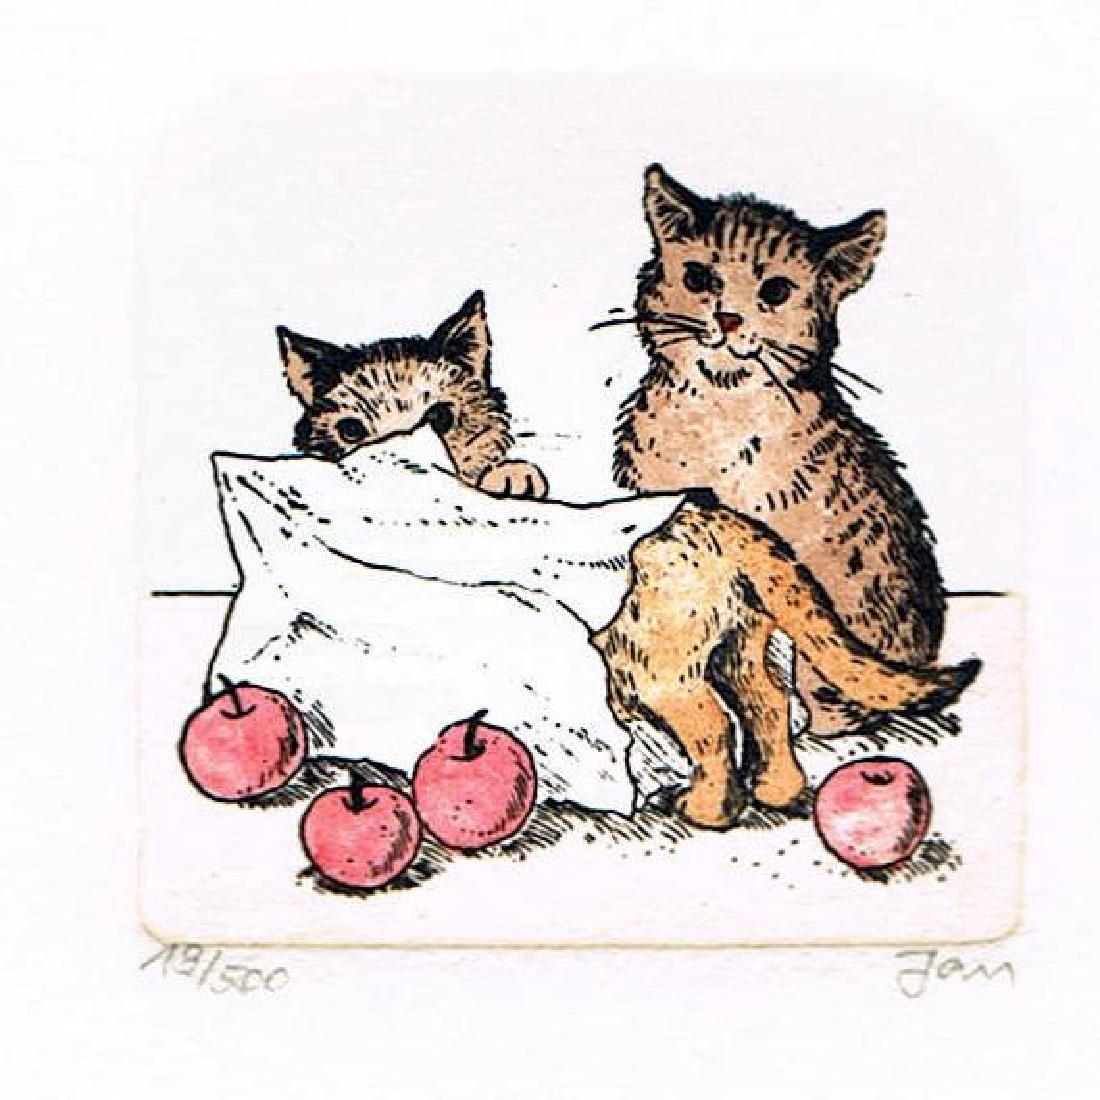 Original Colored Etching Cat Series Buy 3 Get Free - 2